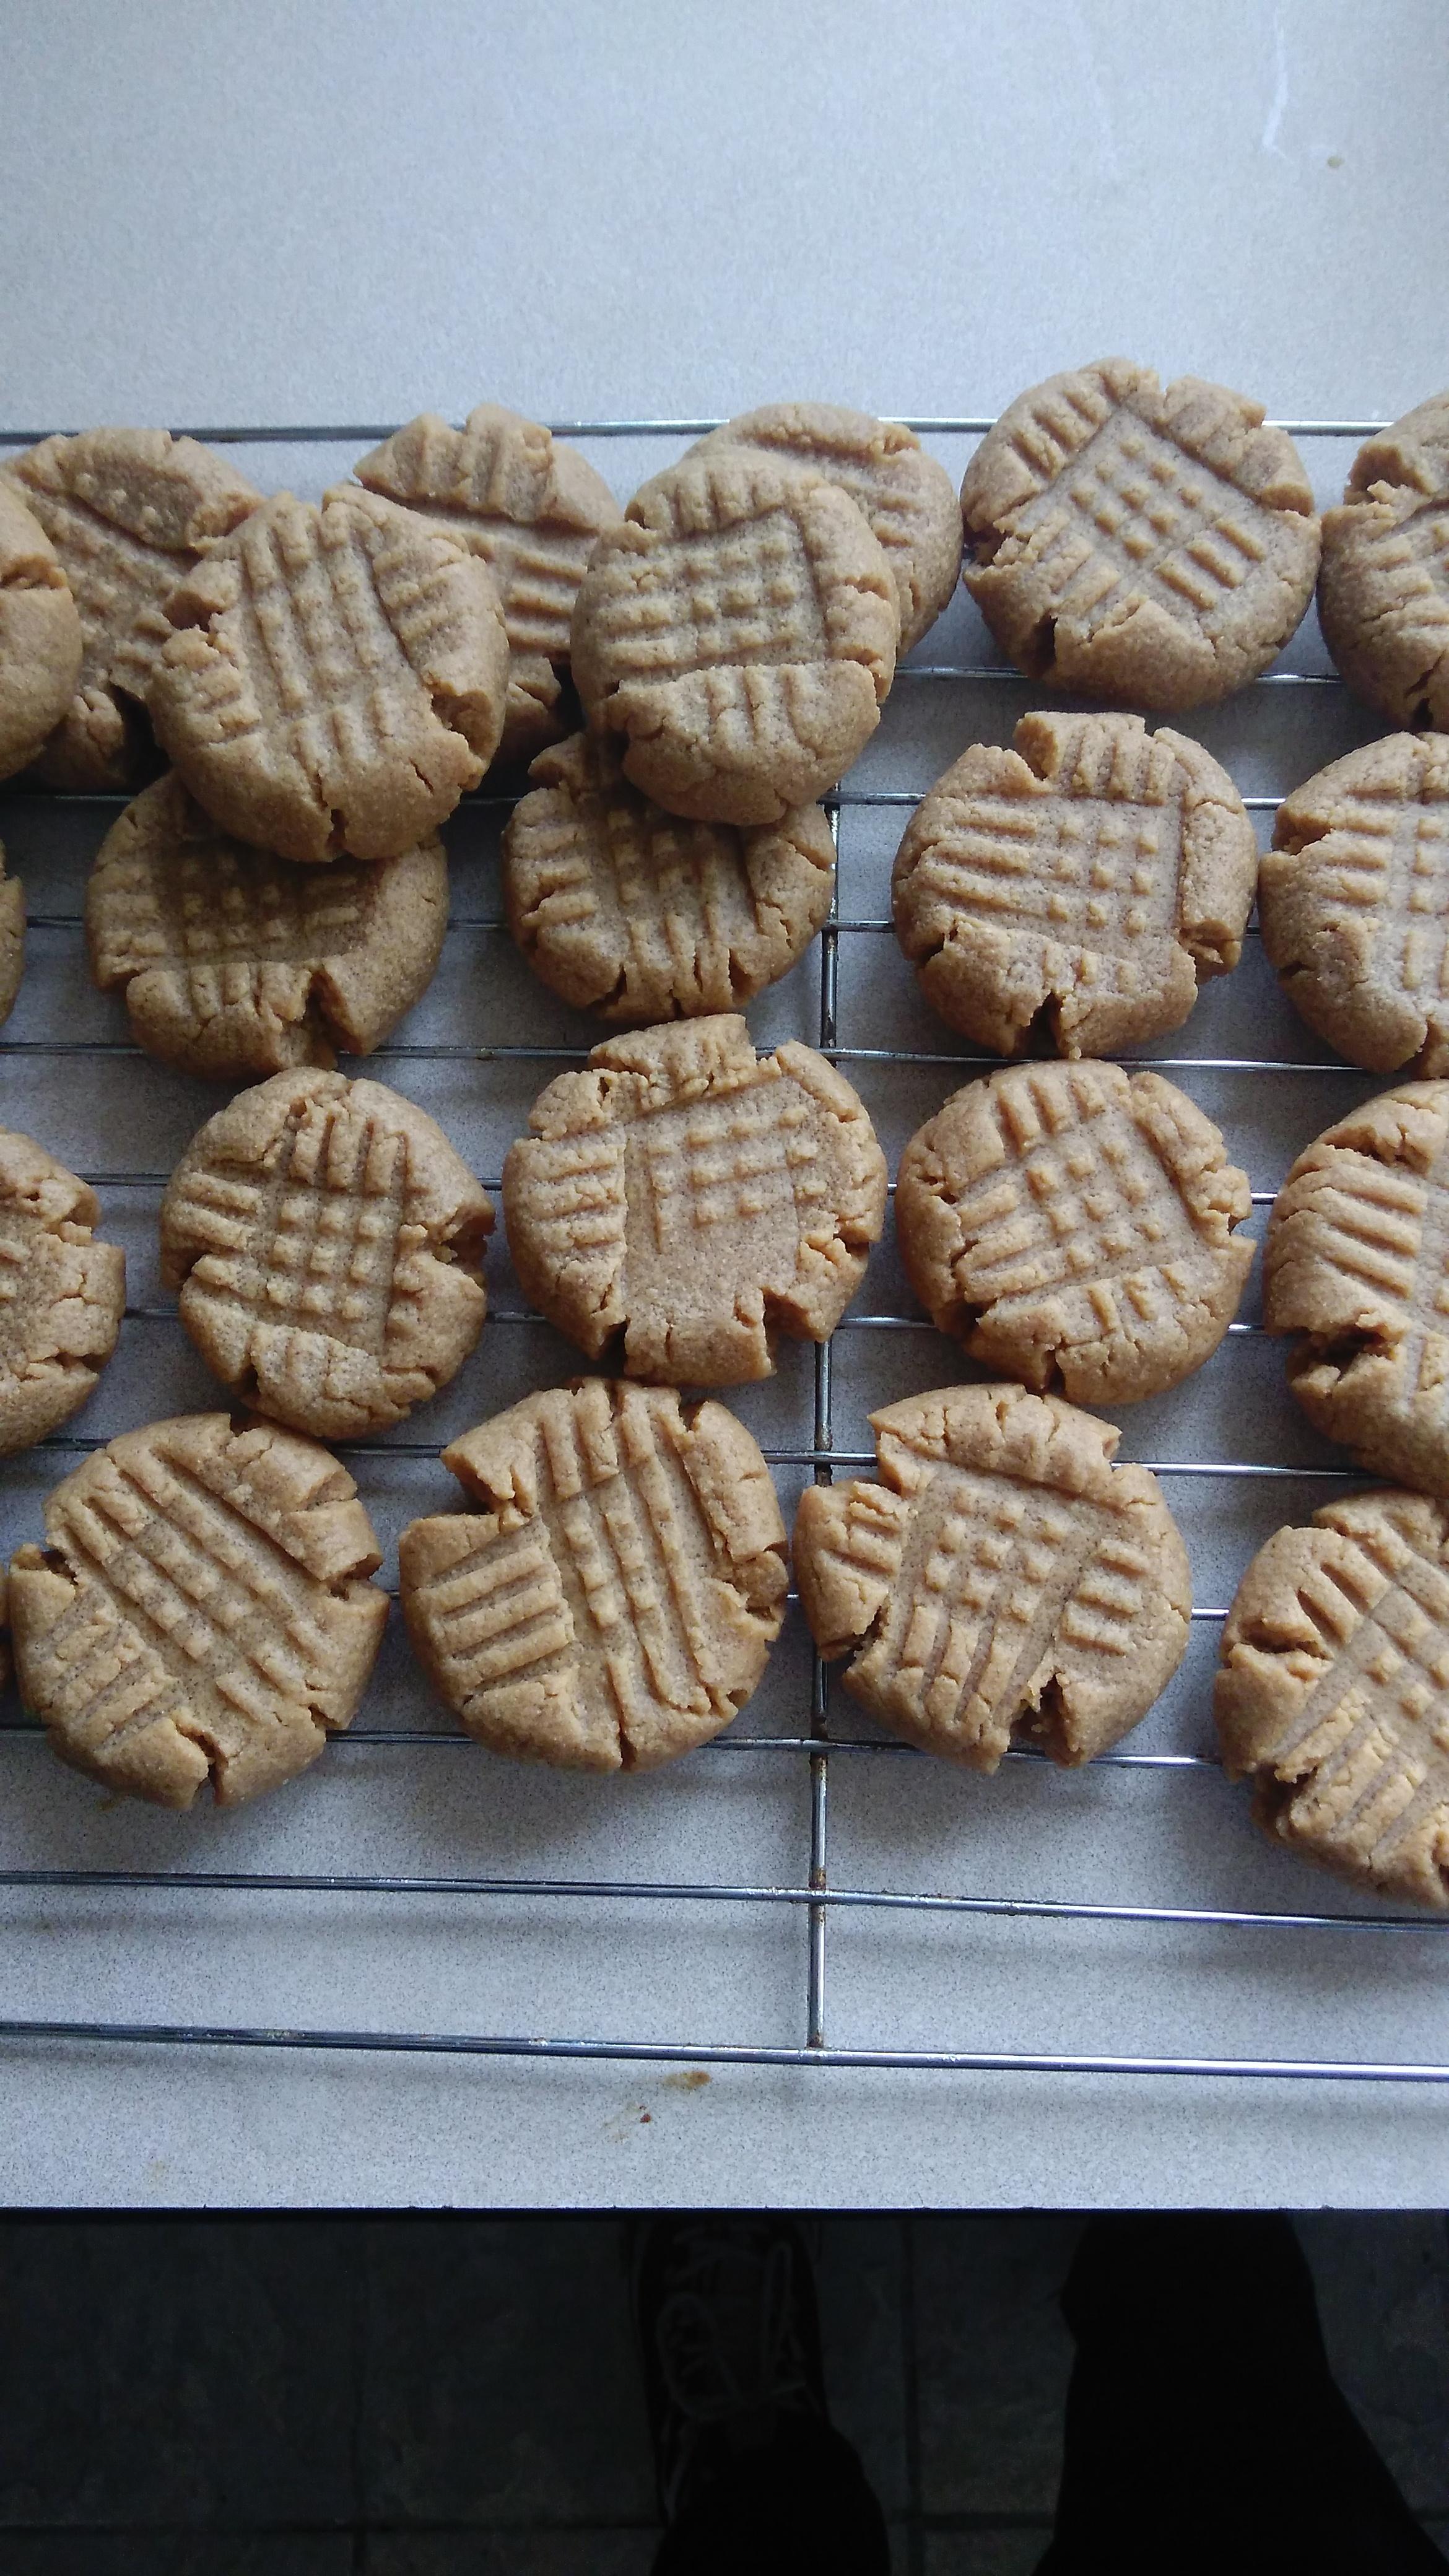 Flourless Peanut Butter Cookies Meredith DeLorenzo